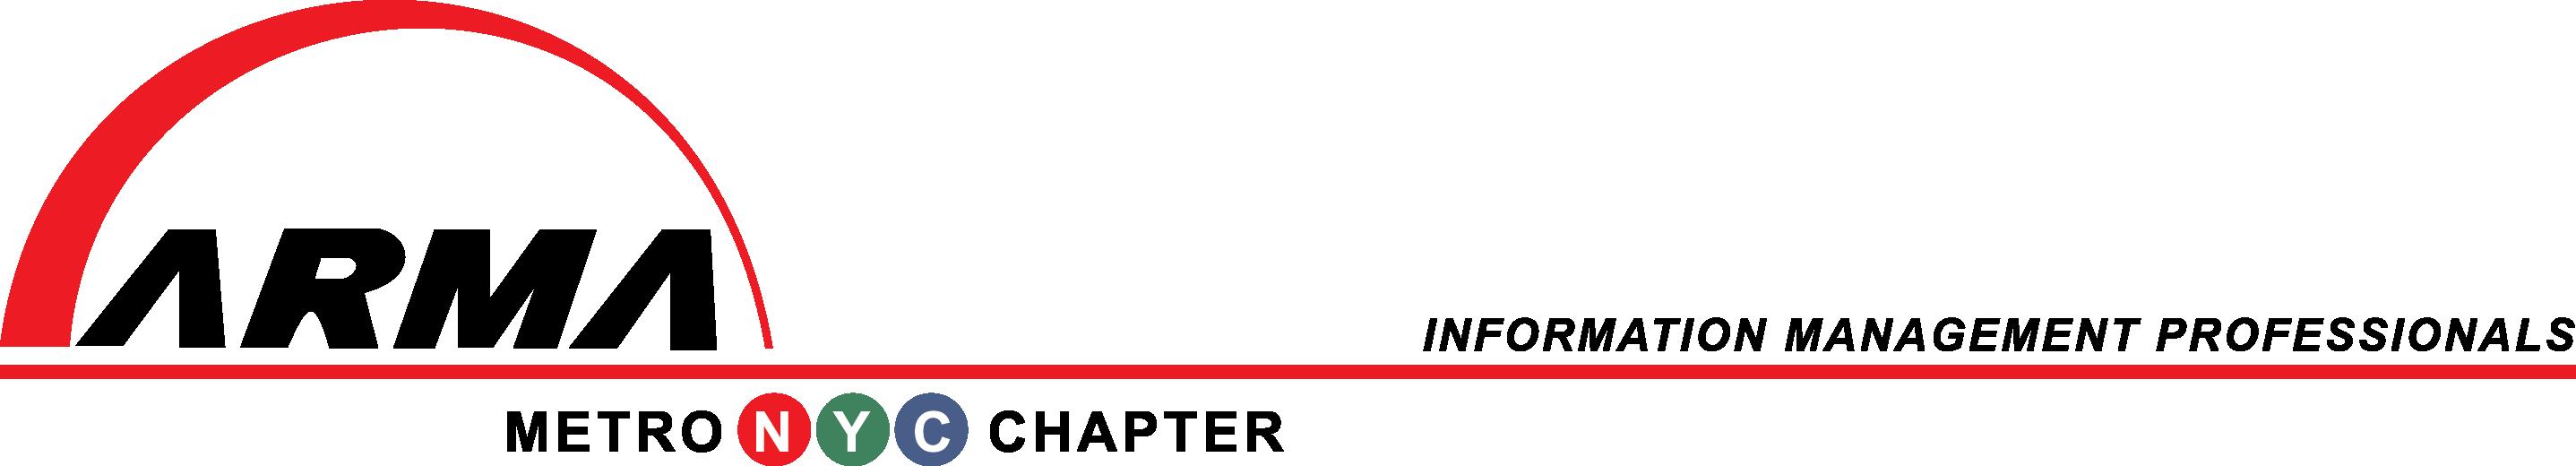 ARMA-logo-horizontal 2014 No Bkgrd